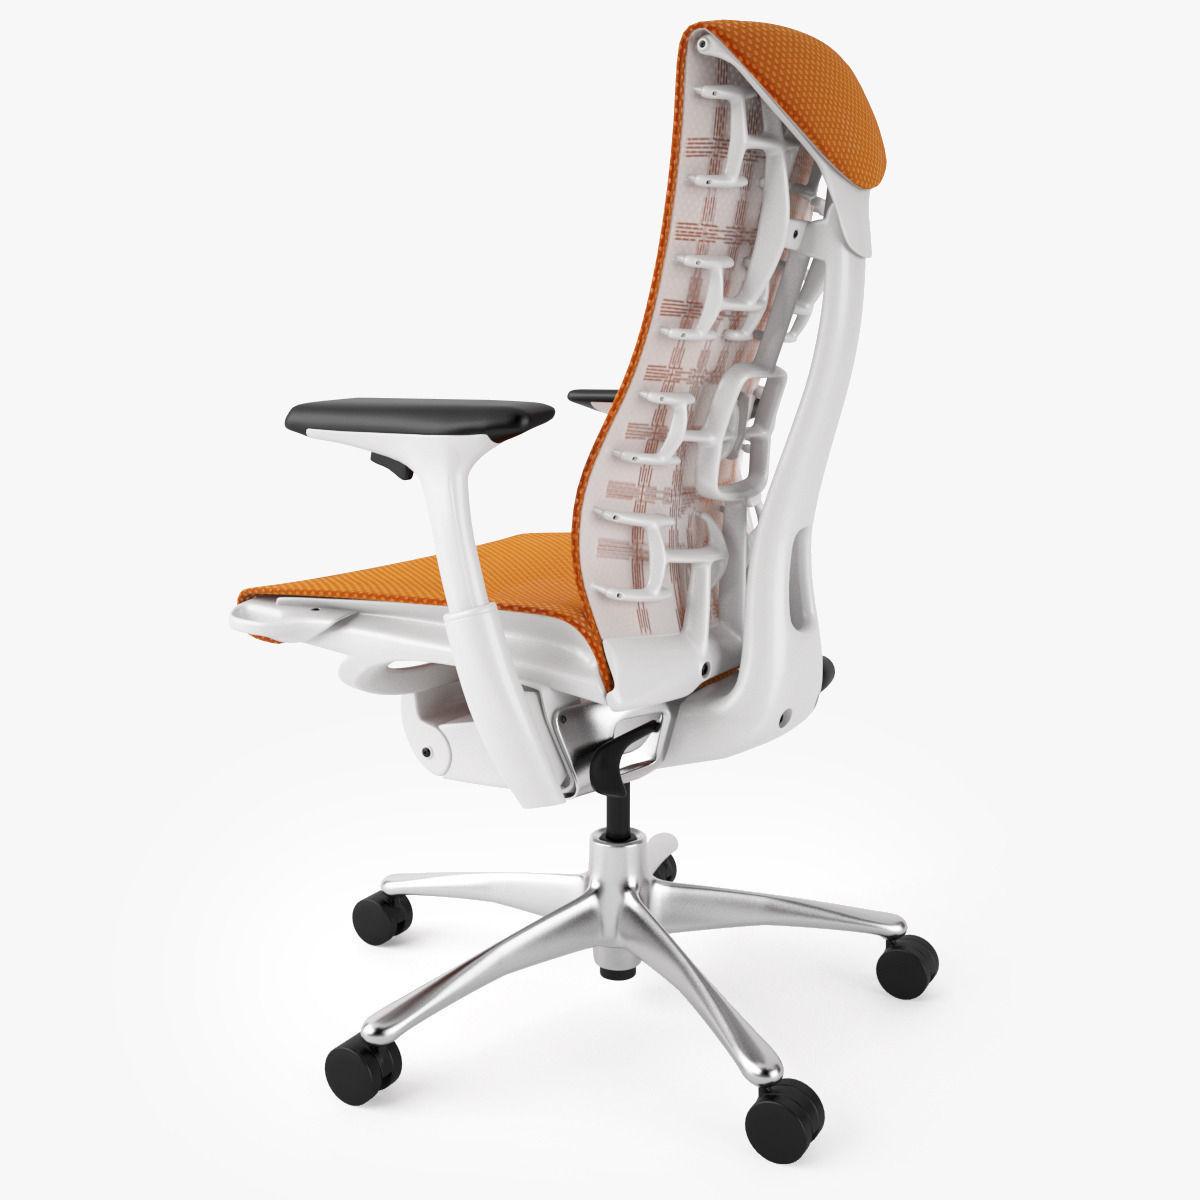 Top 5 best ergonomic office chairs 3d model max obj fbx for Ergonomic chair